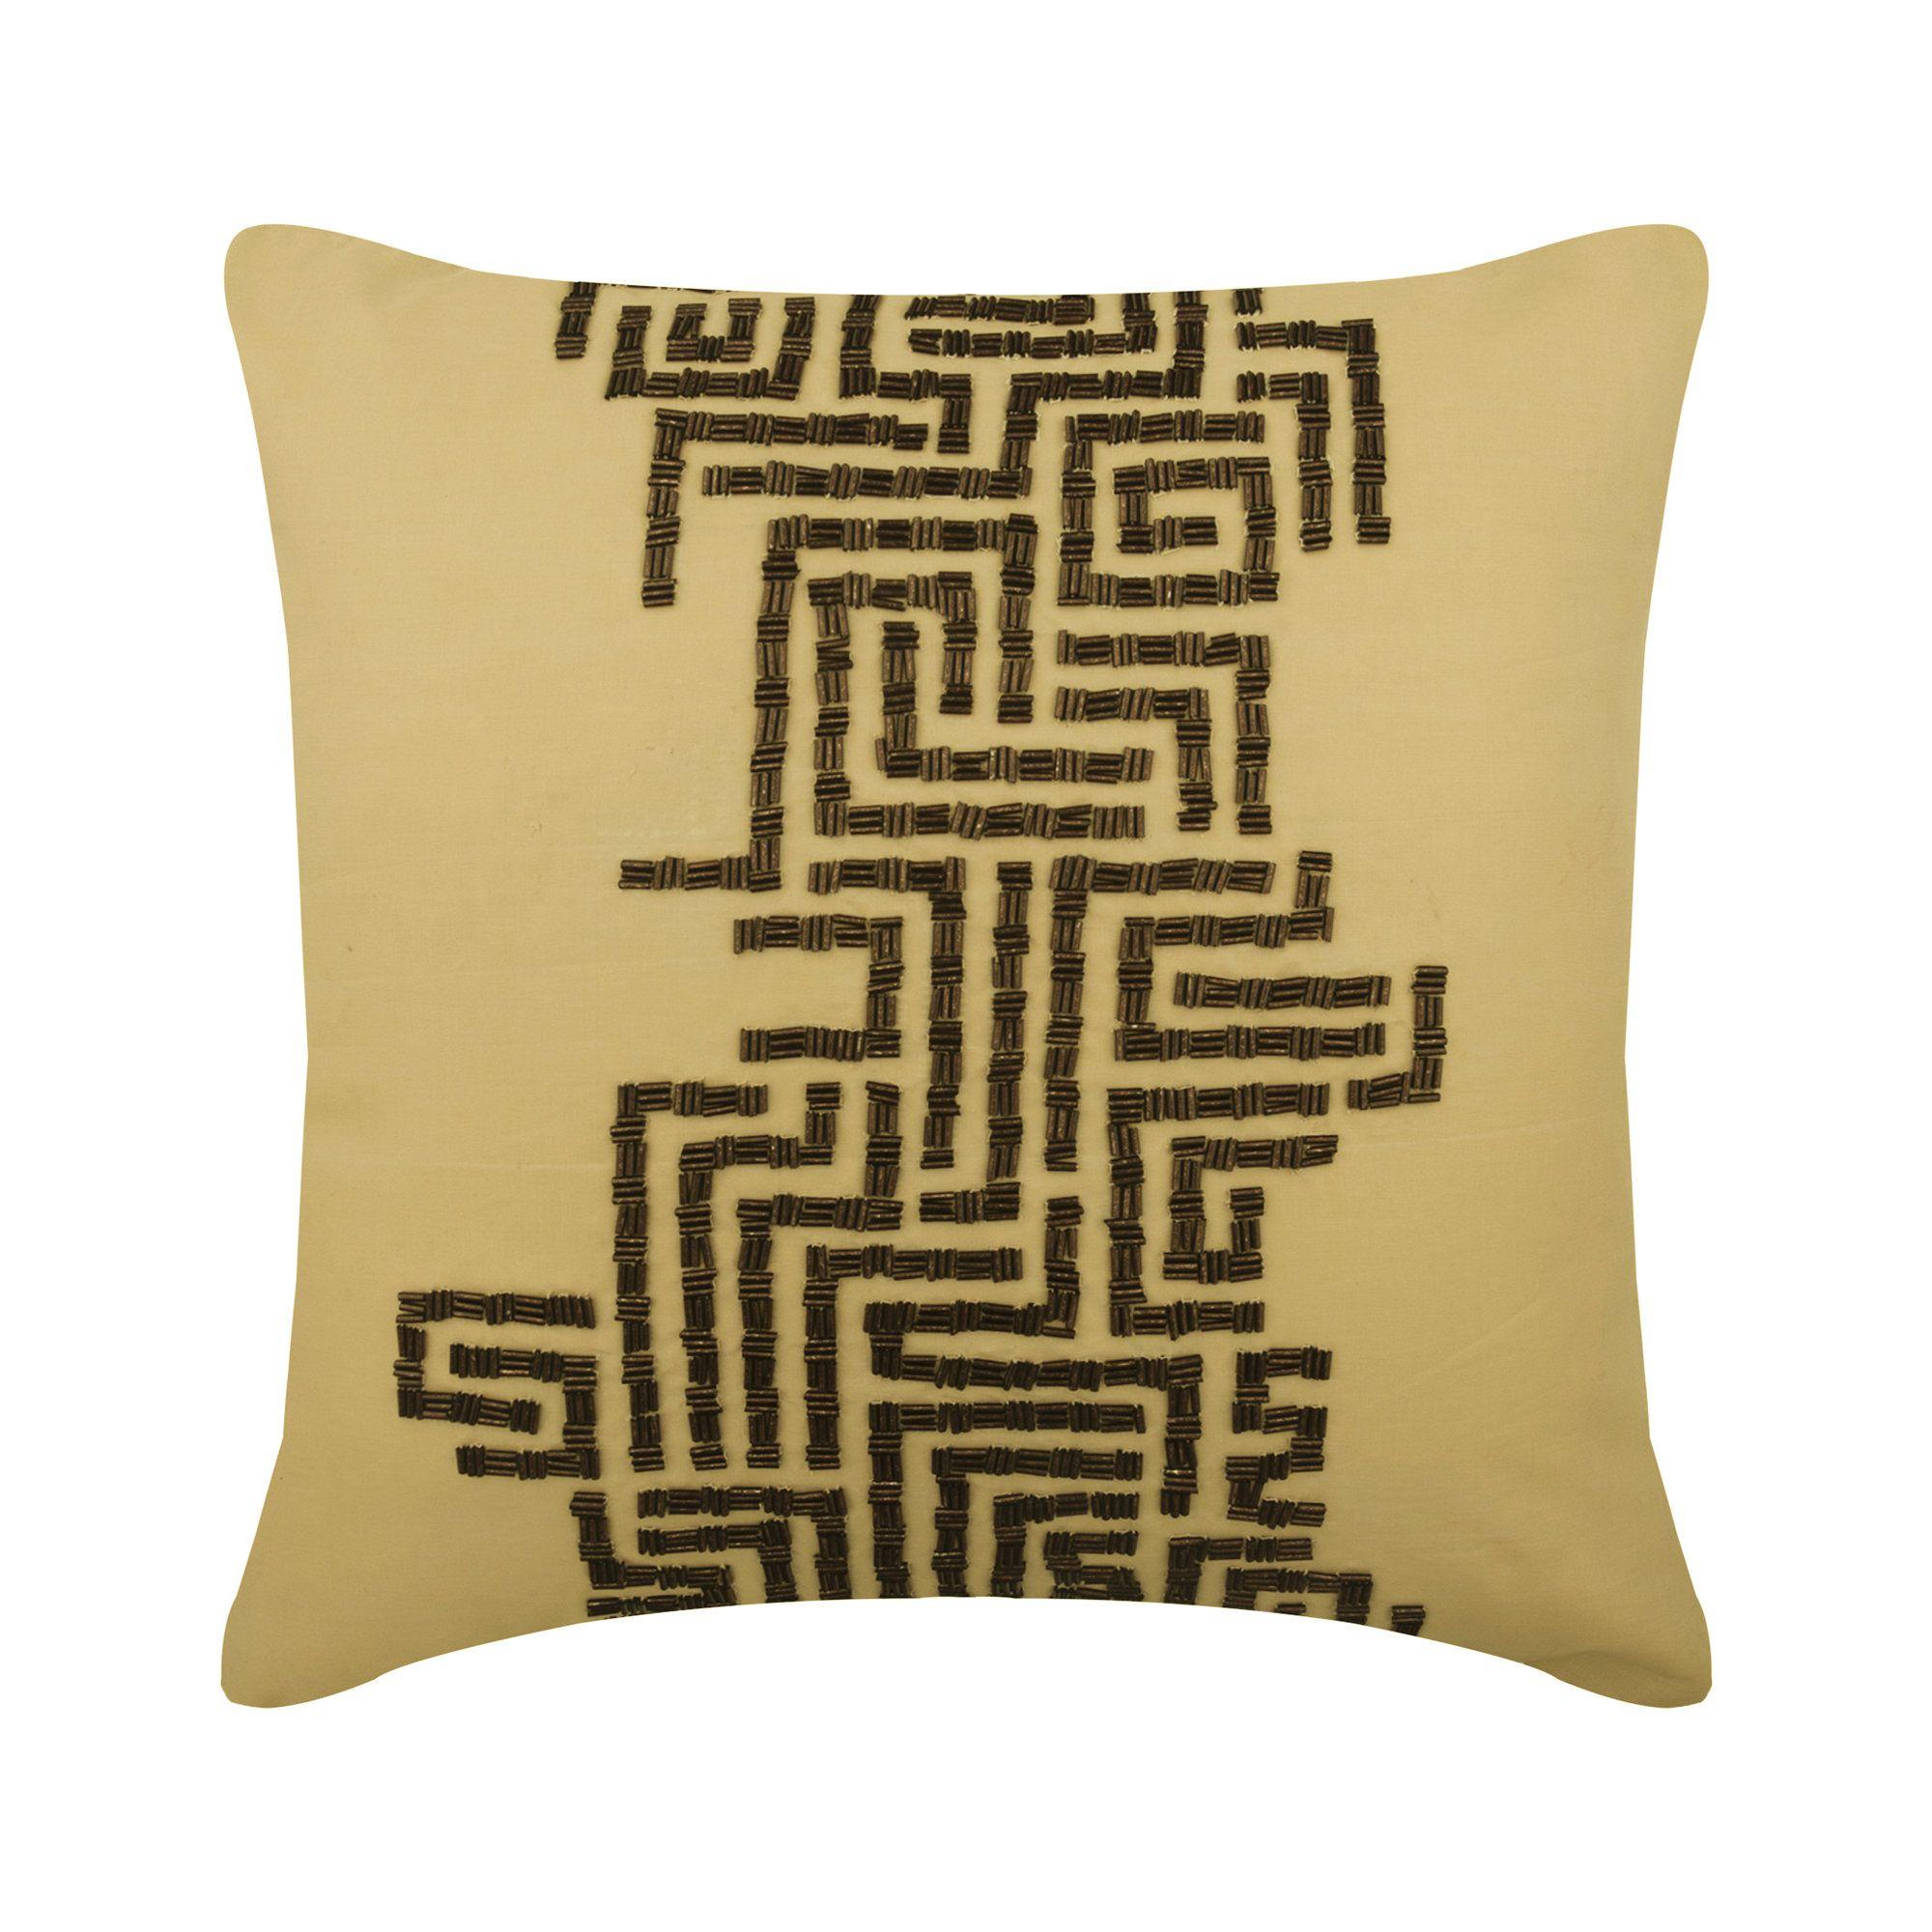 16x16 designer gold sofa cushion cover